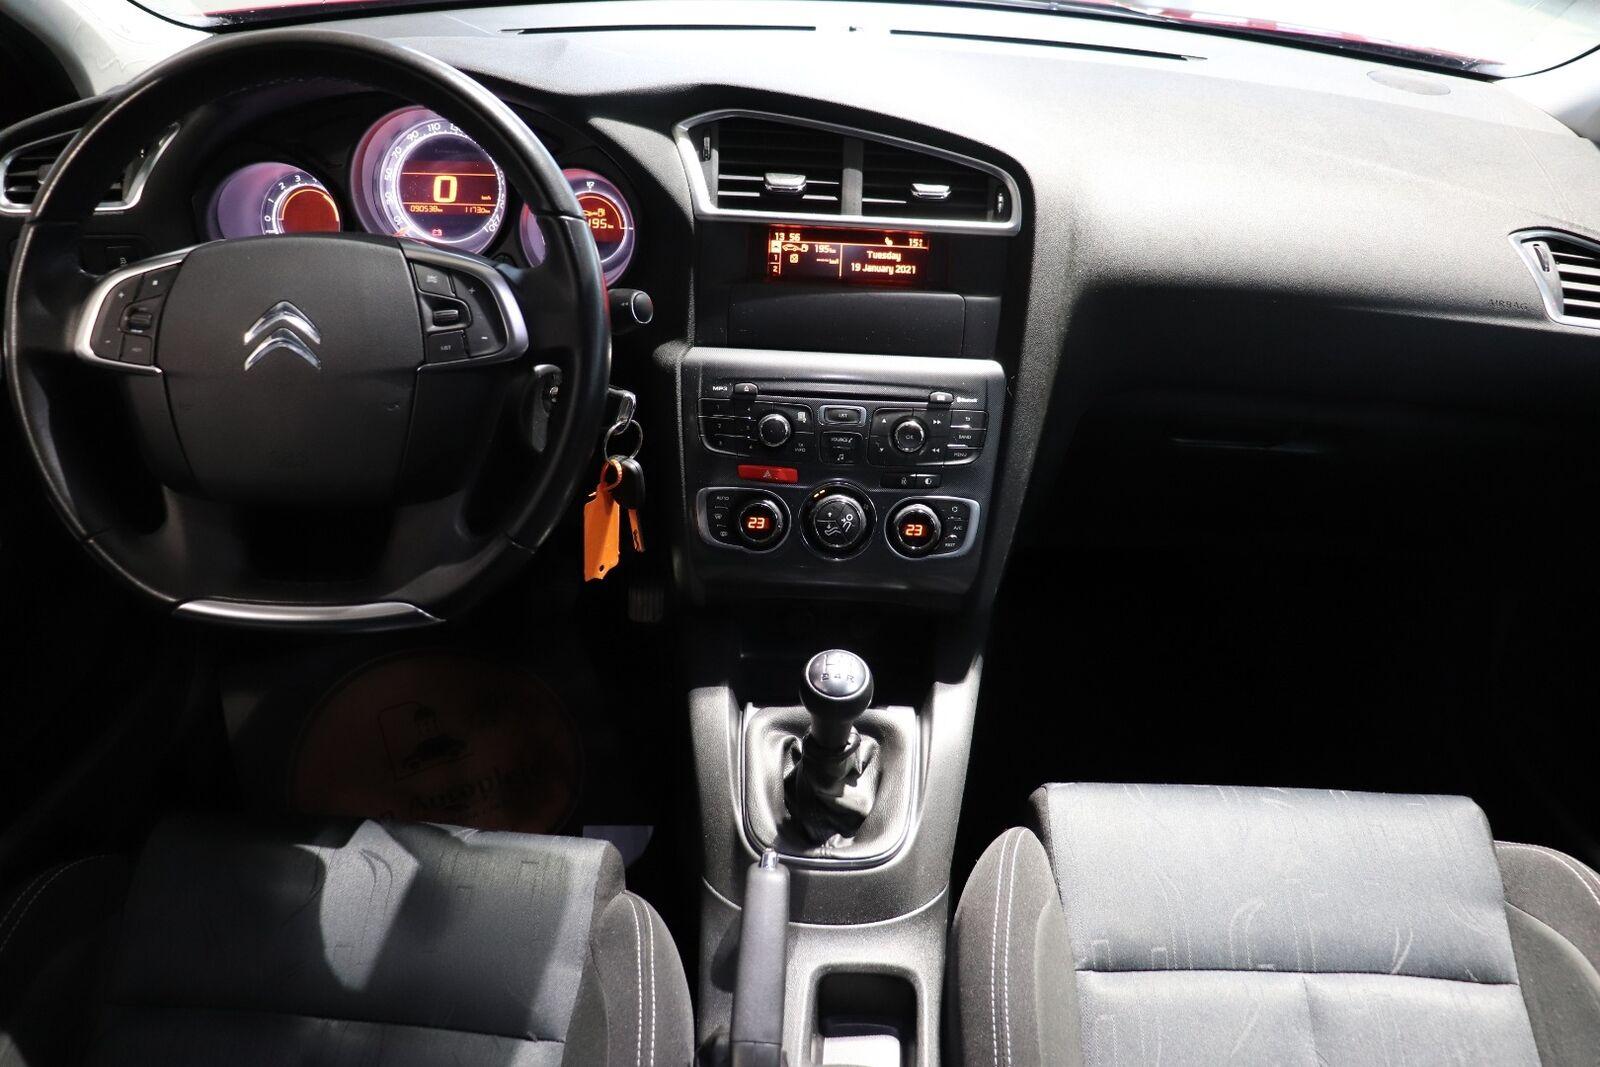 Citroën C4 HDi 90 Seduction